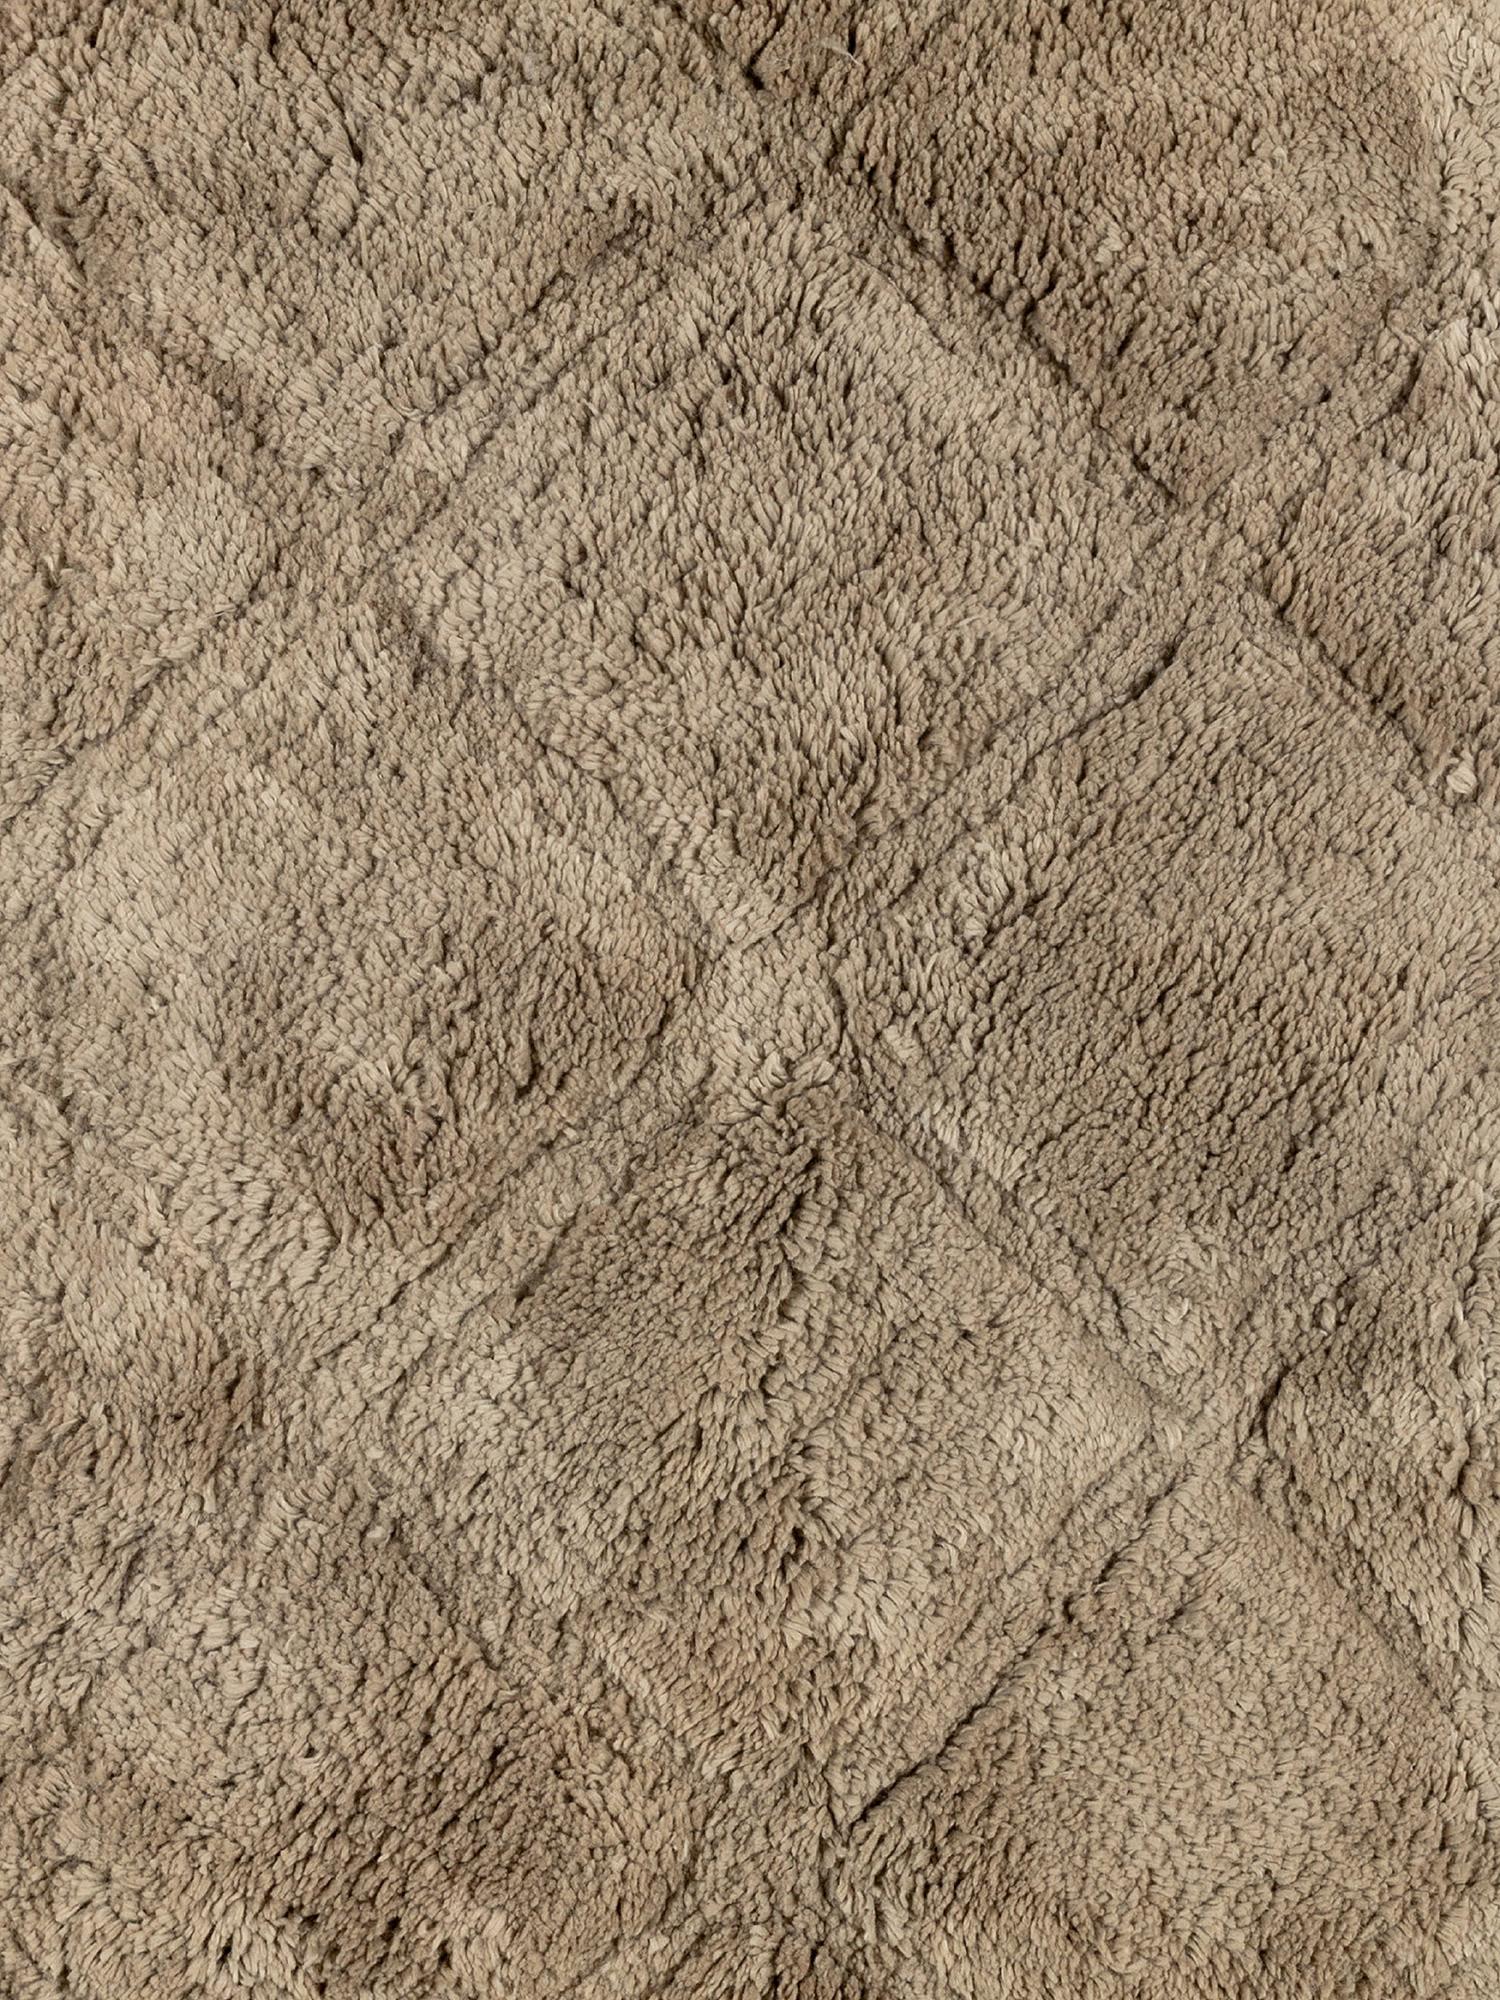 Tappeto bagno spugna di cotone motivo a rombi, Beige, large image number 1